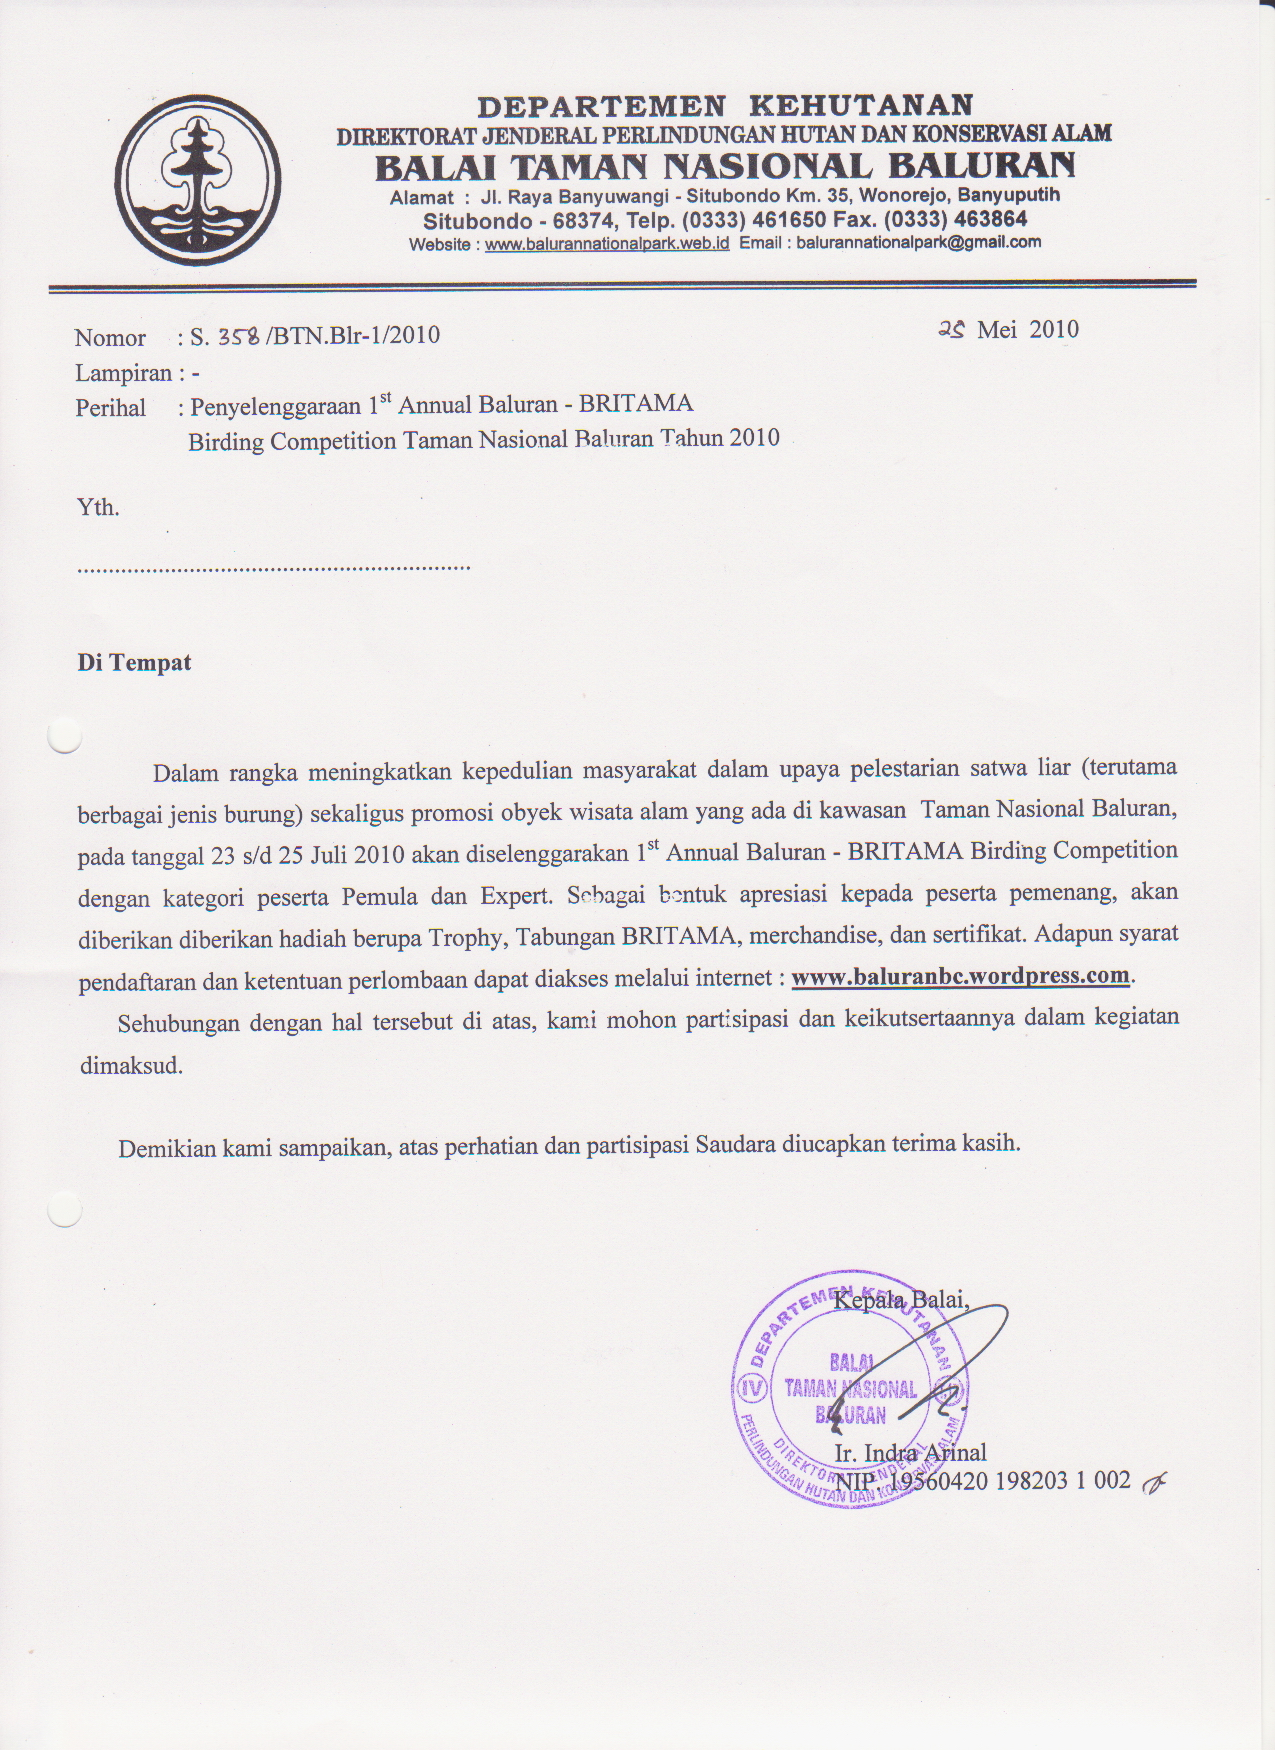 Surat Undangan (JPEG)